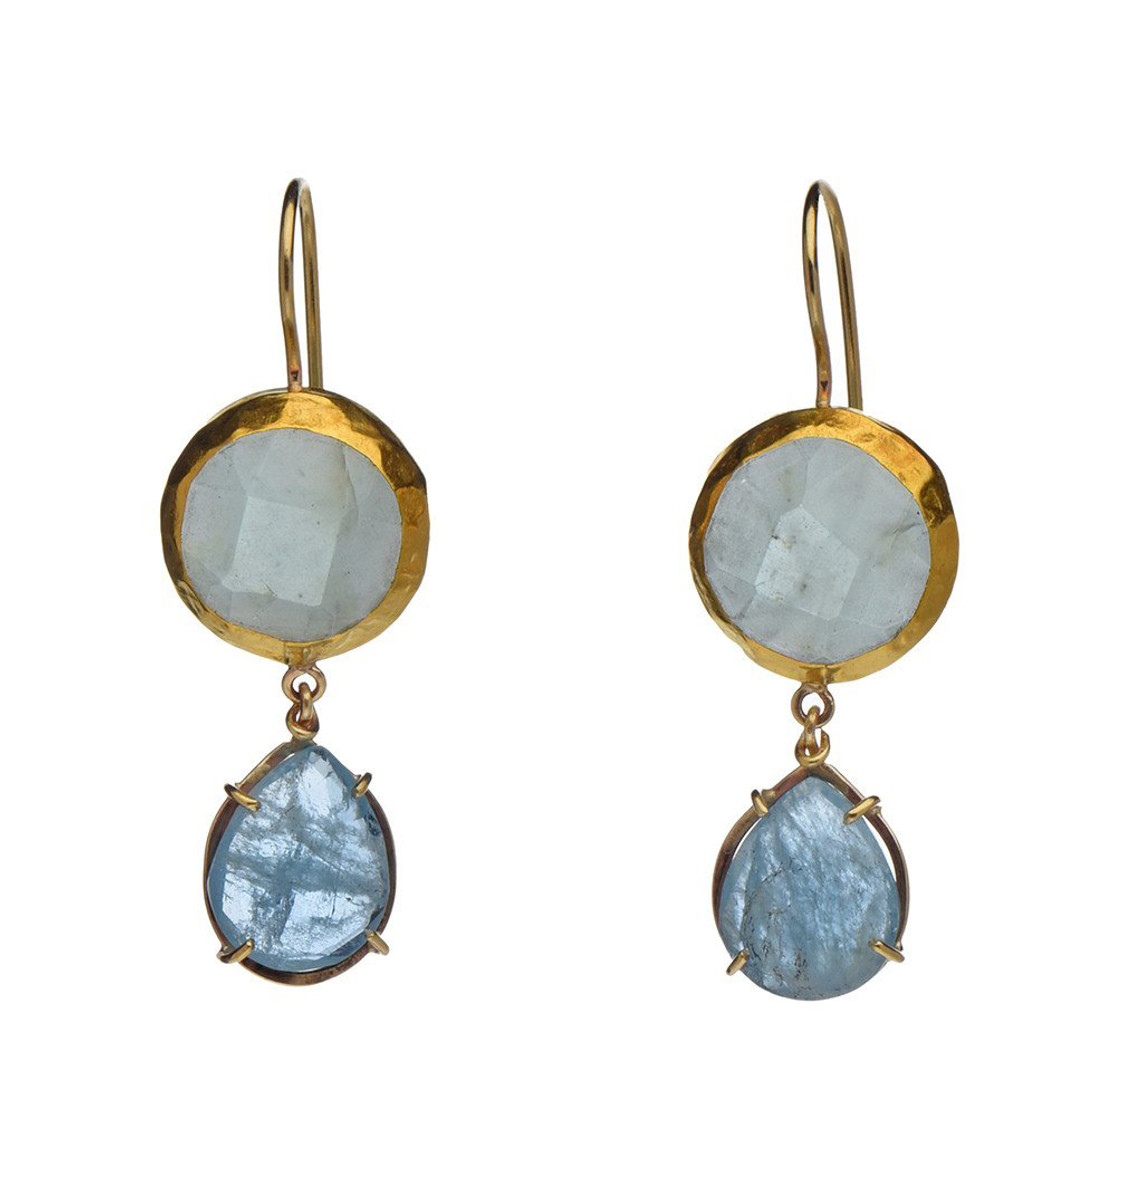 Exclusive Aquamarine Earrings by Nava Zahavi - New Arrival